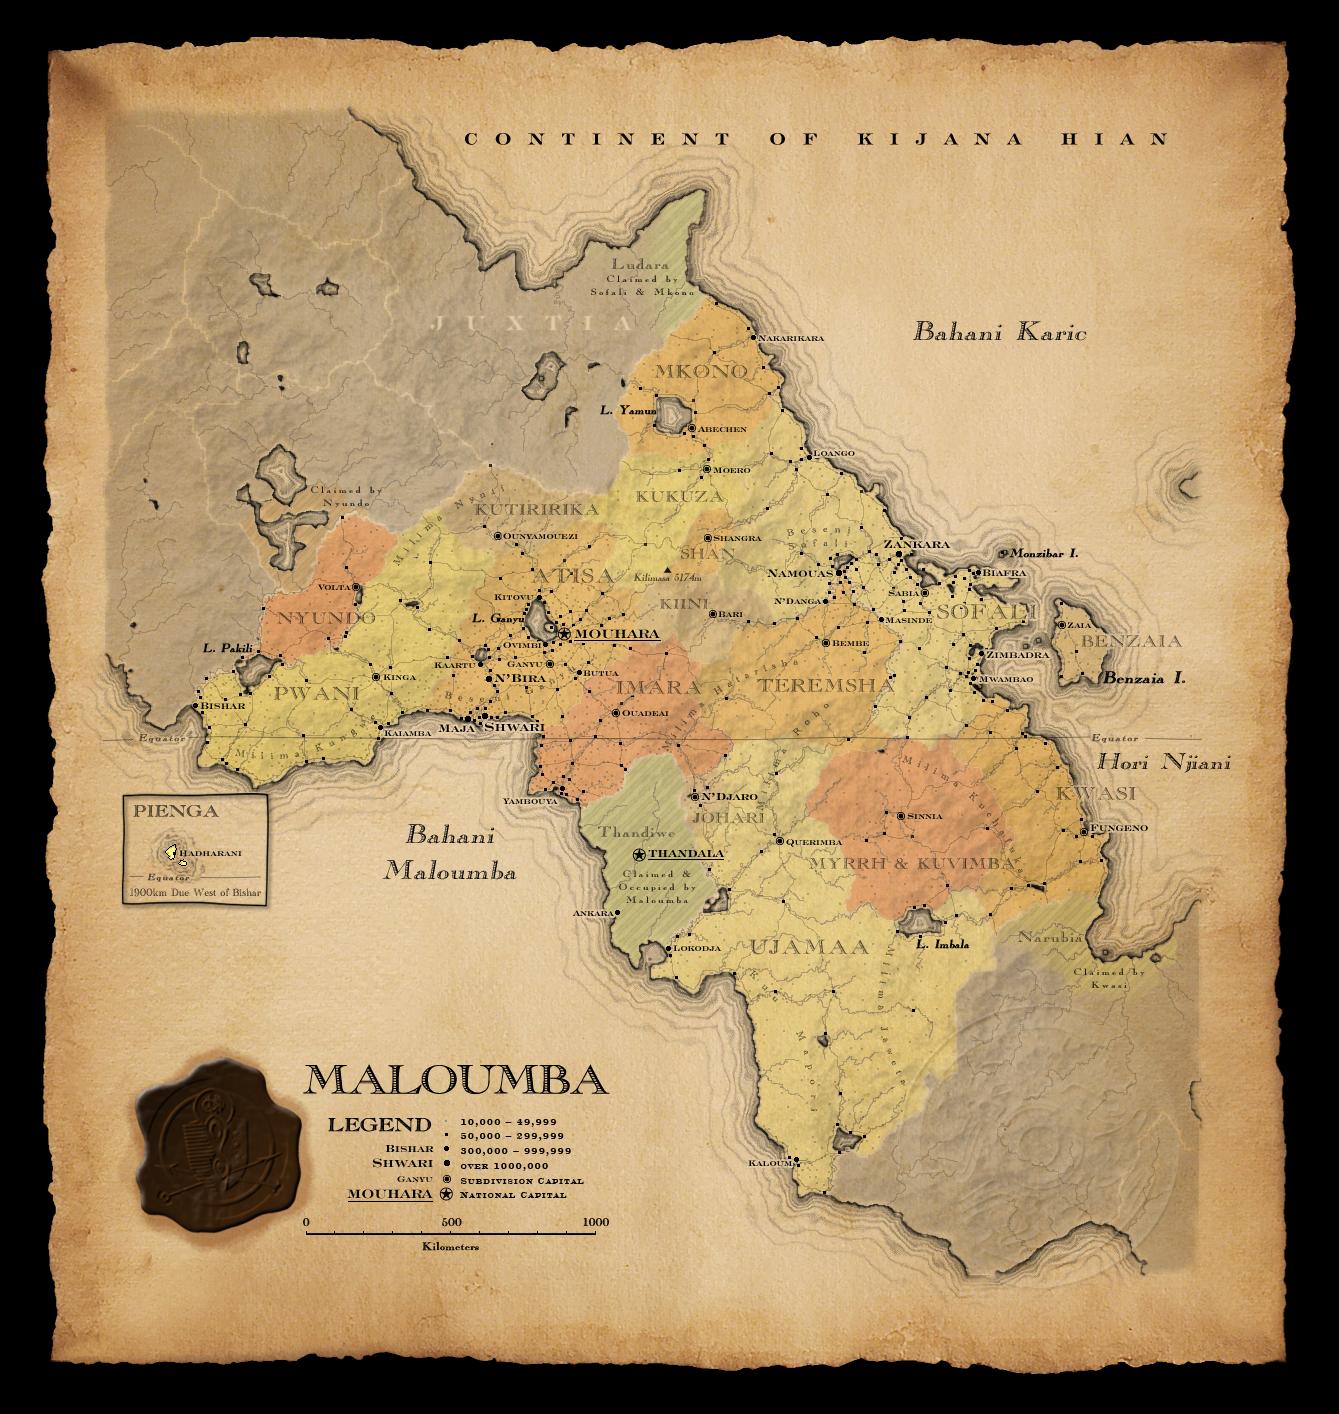 maloumba map parchment